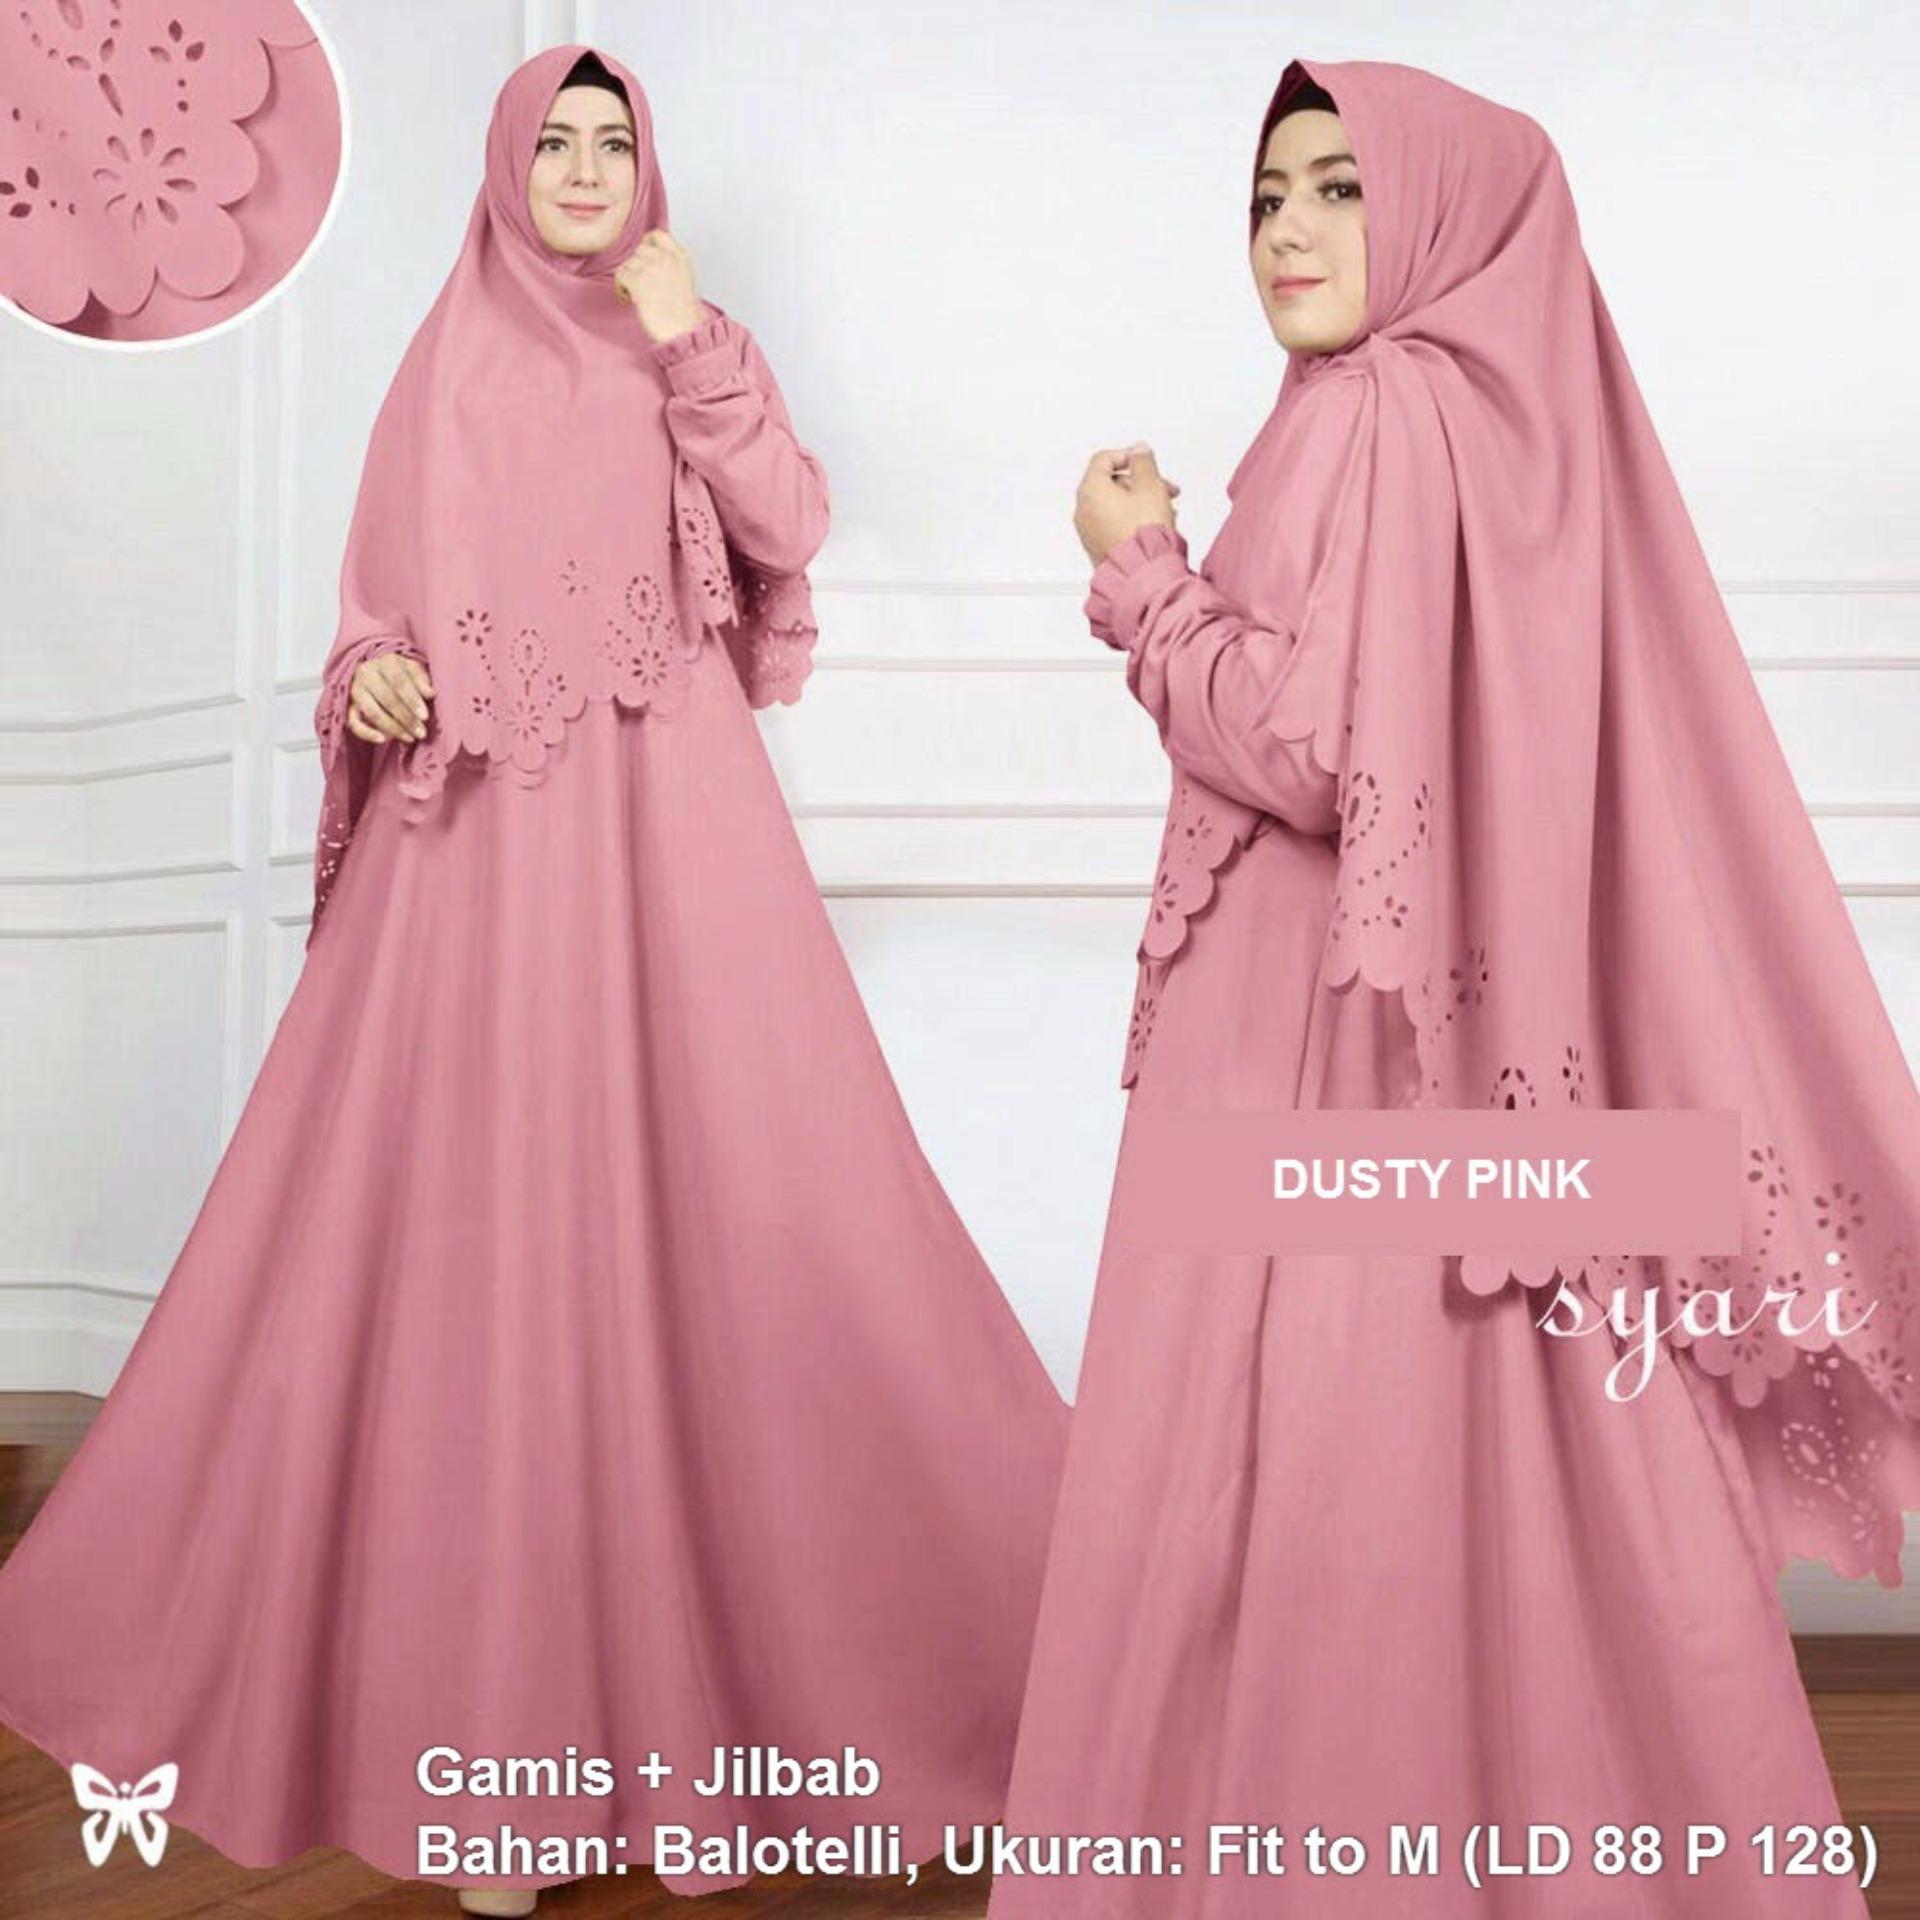 Flavia Store Gamis Syari Set 2 in 1 Laser FS0676 - DUSTY PINK / Baju Muslim